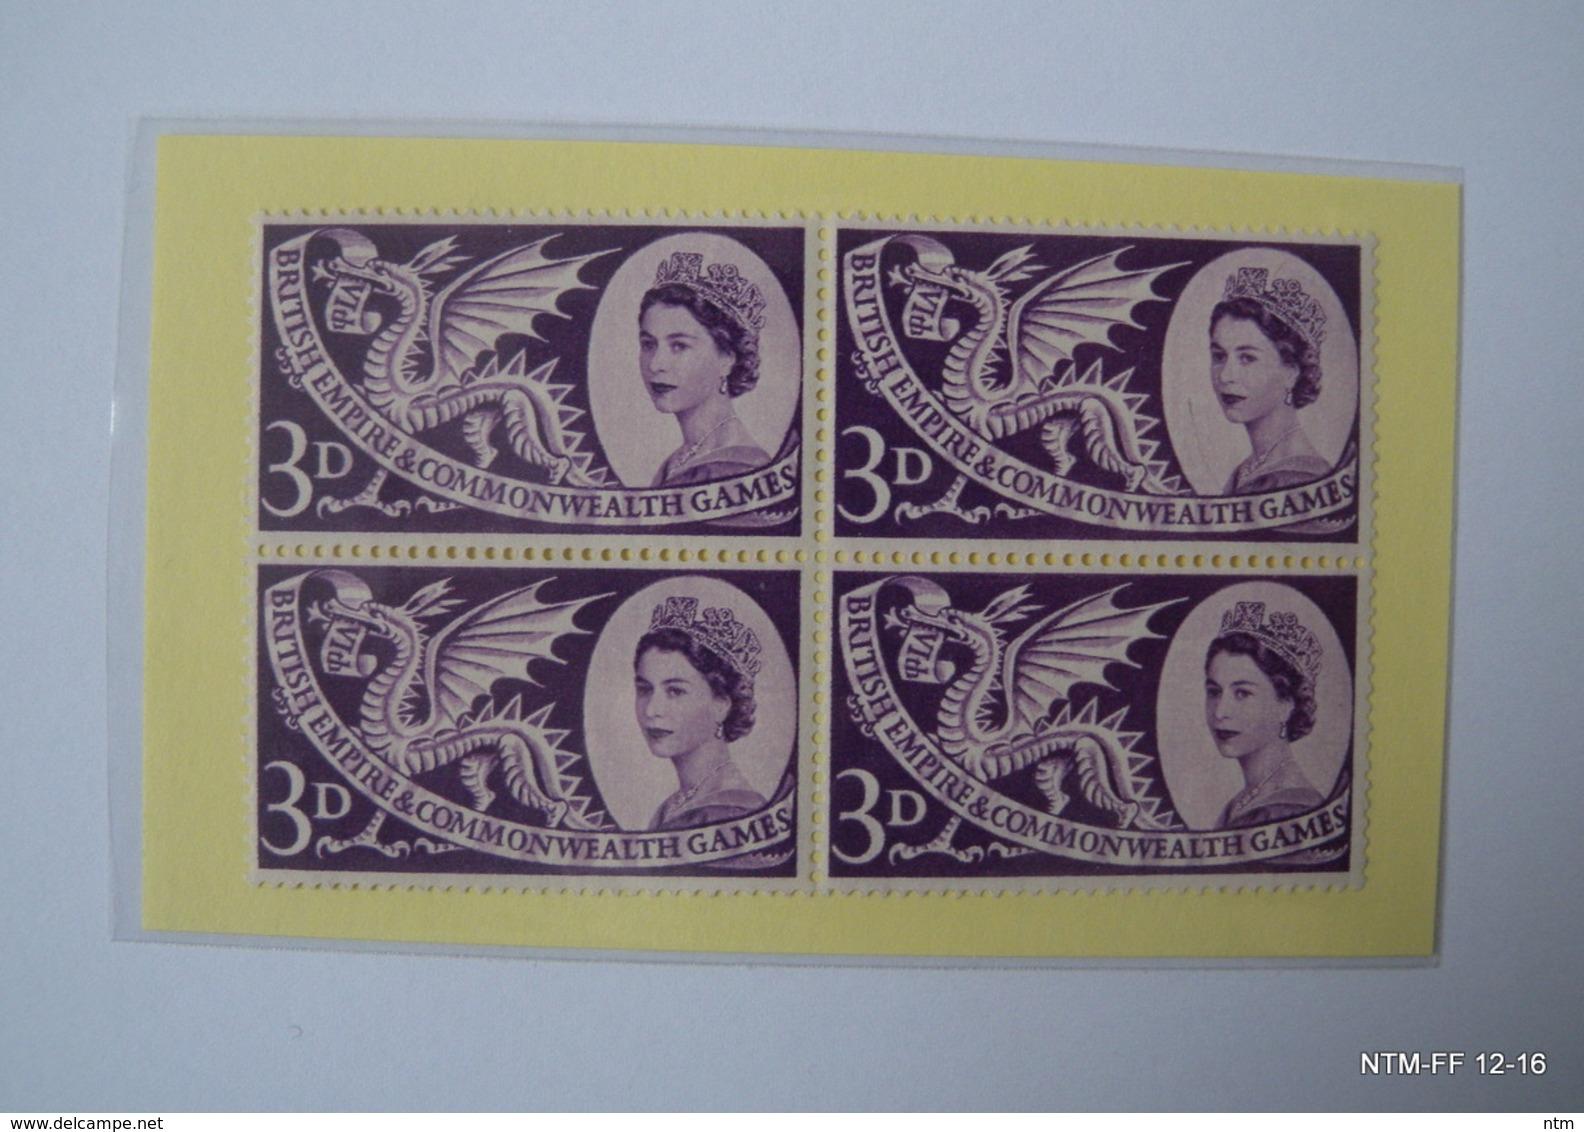 GREAT BRITAIN 1958: Queen Elizabeth II - COMMON WEALTH GAMES, CARDIFF SG 567-69. MNH - BLOCKS OF 4 STAMPS - 1952-.... (Elizabeth II)